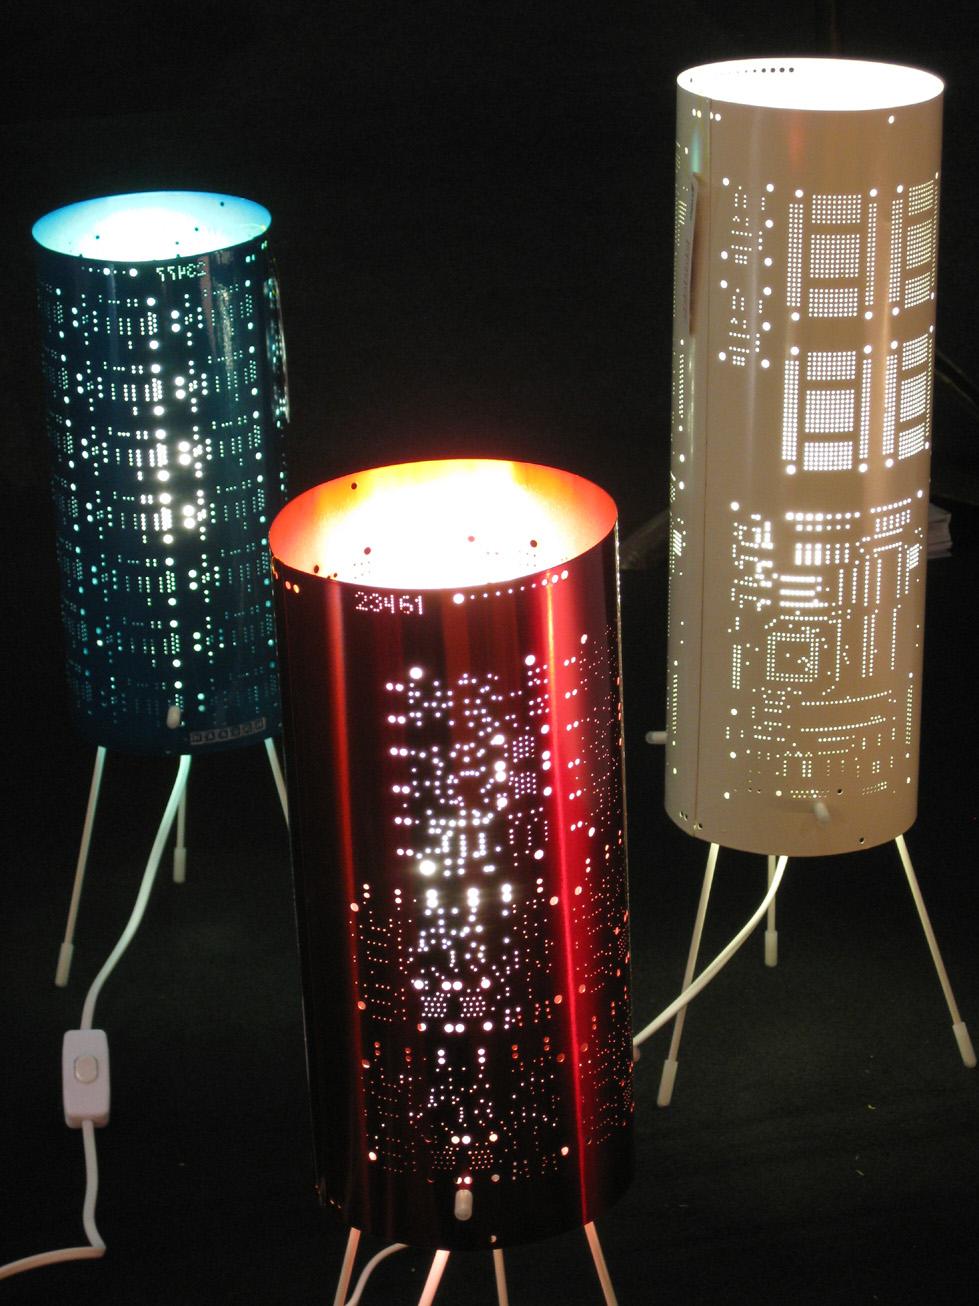 AL SERIES TABLE LAMP Dimensions Small 2